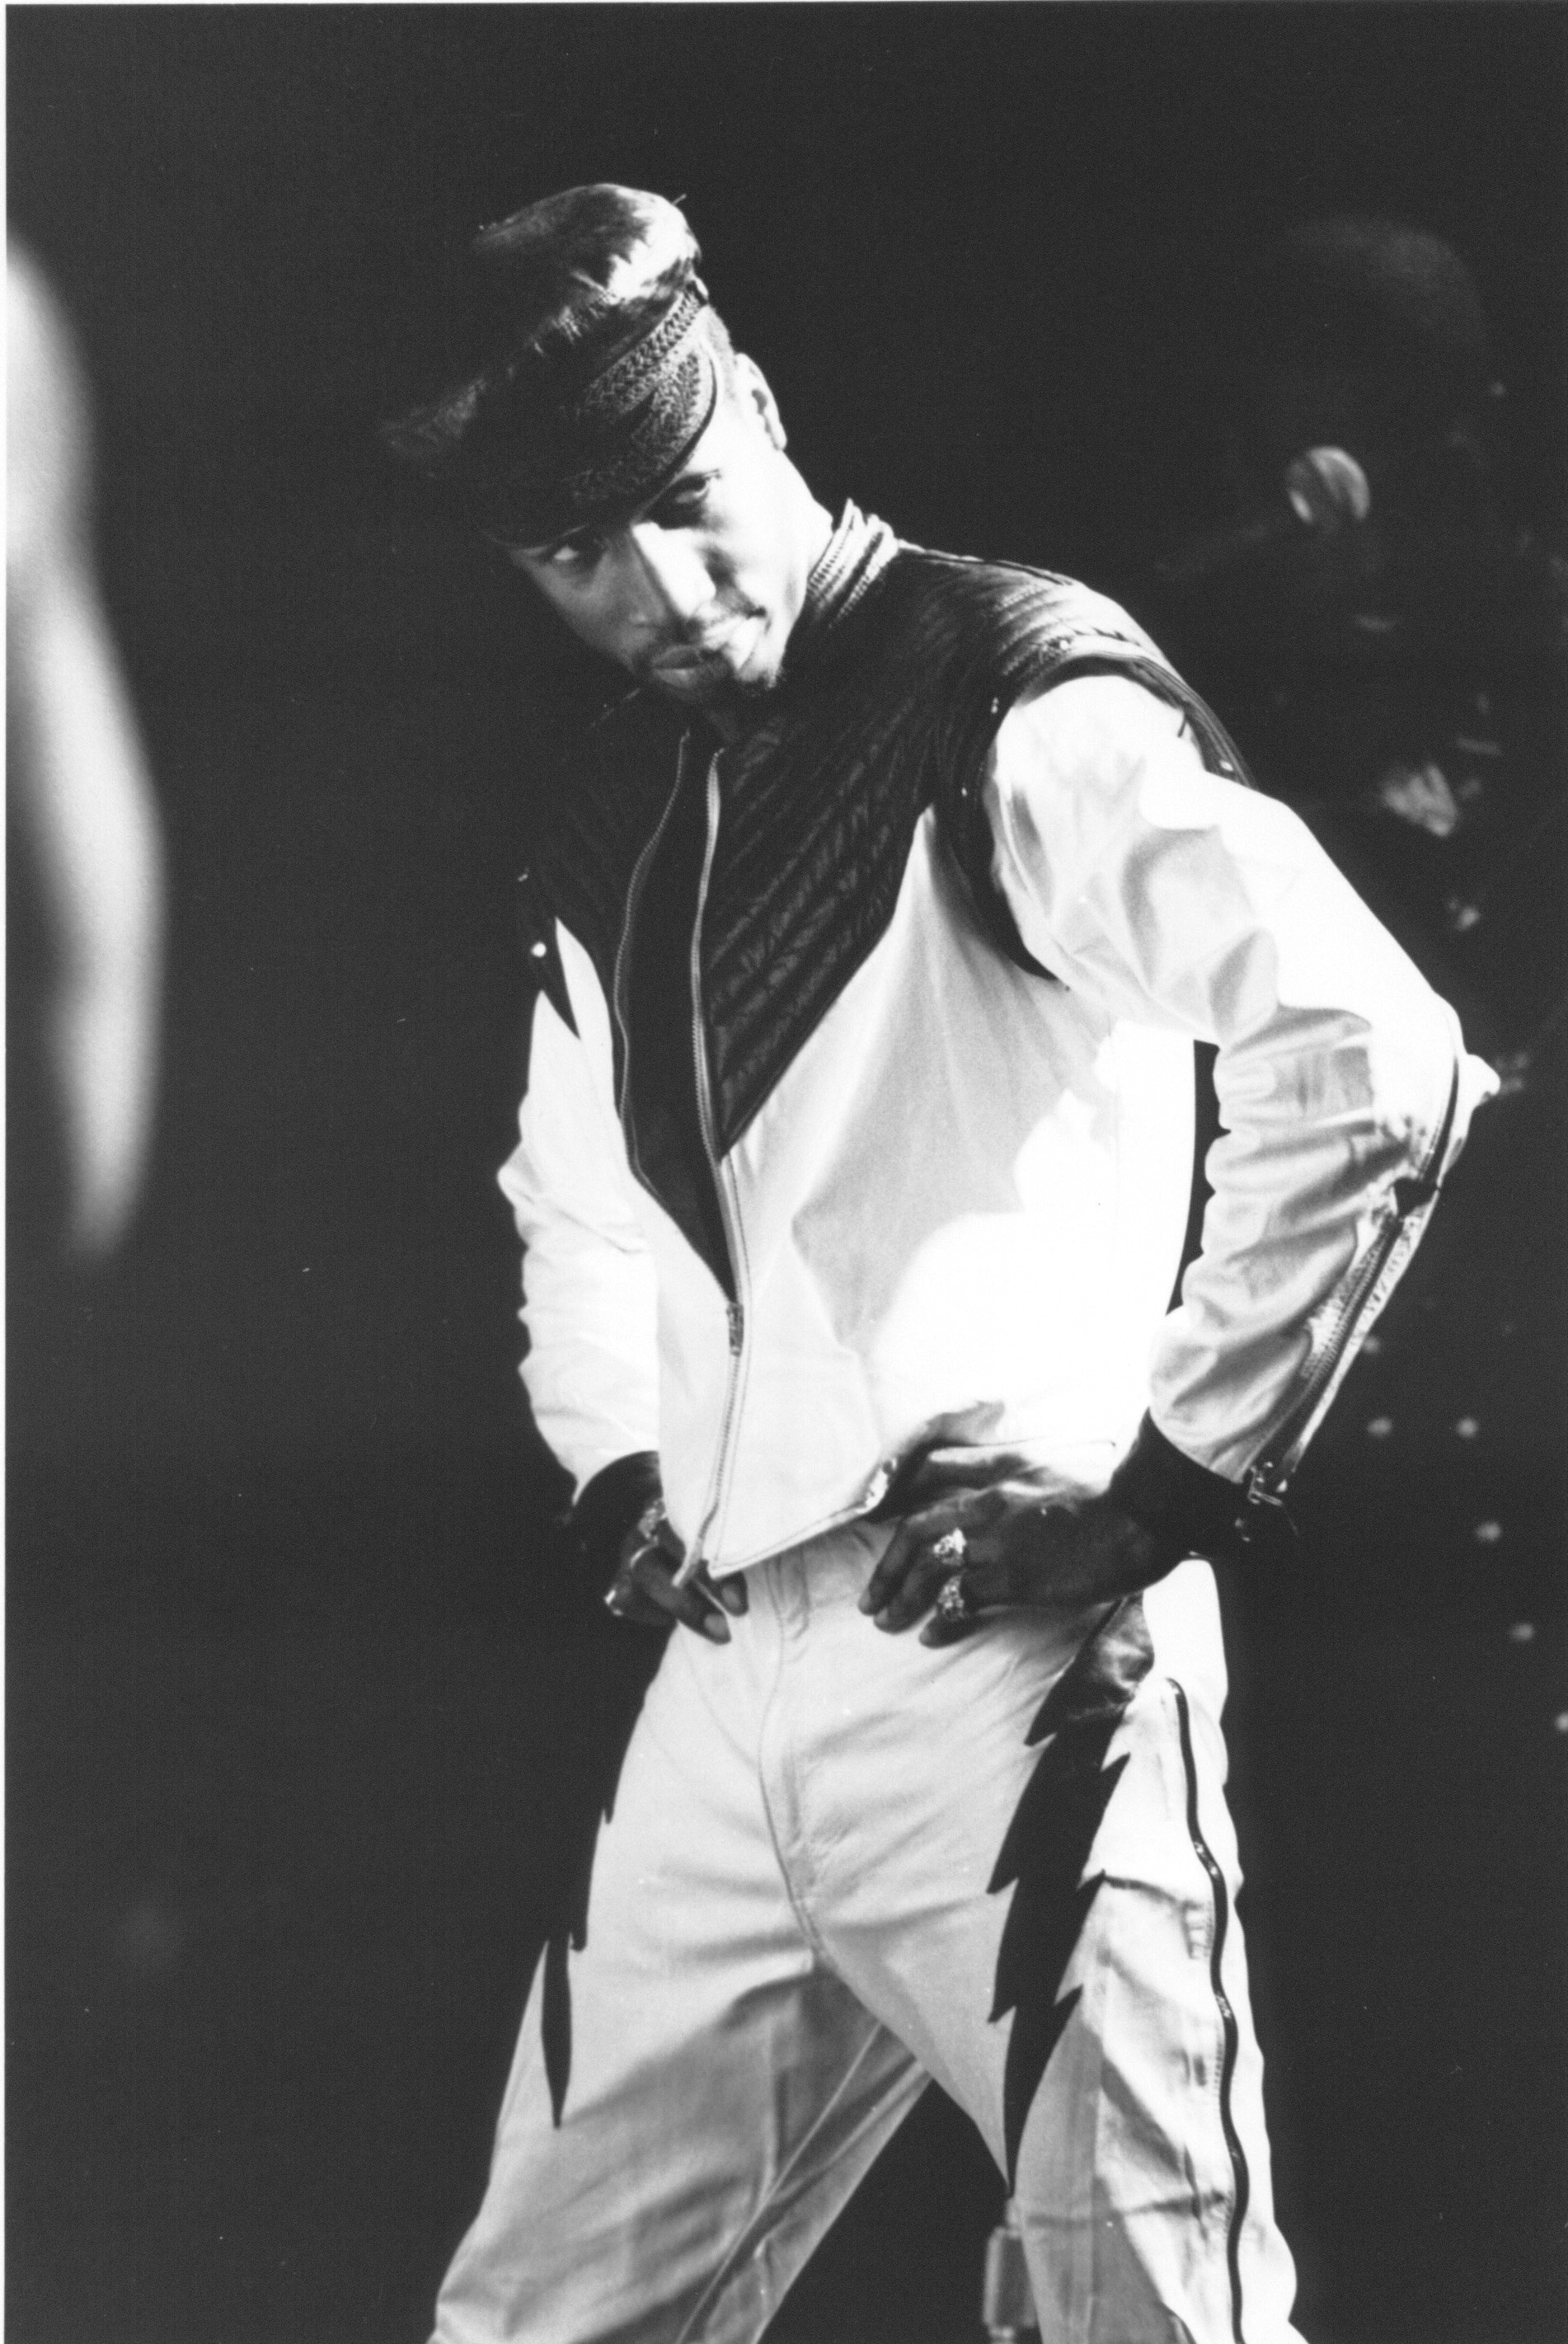 Grandmaster Flash in 1982. (Photo by Chris Walter/WireImage)